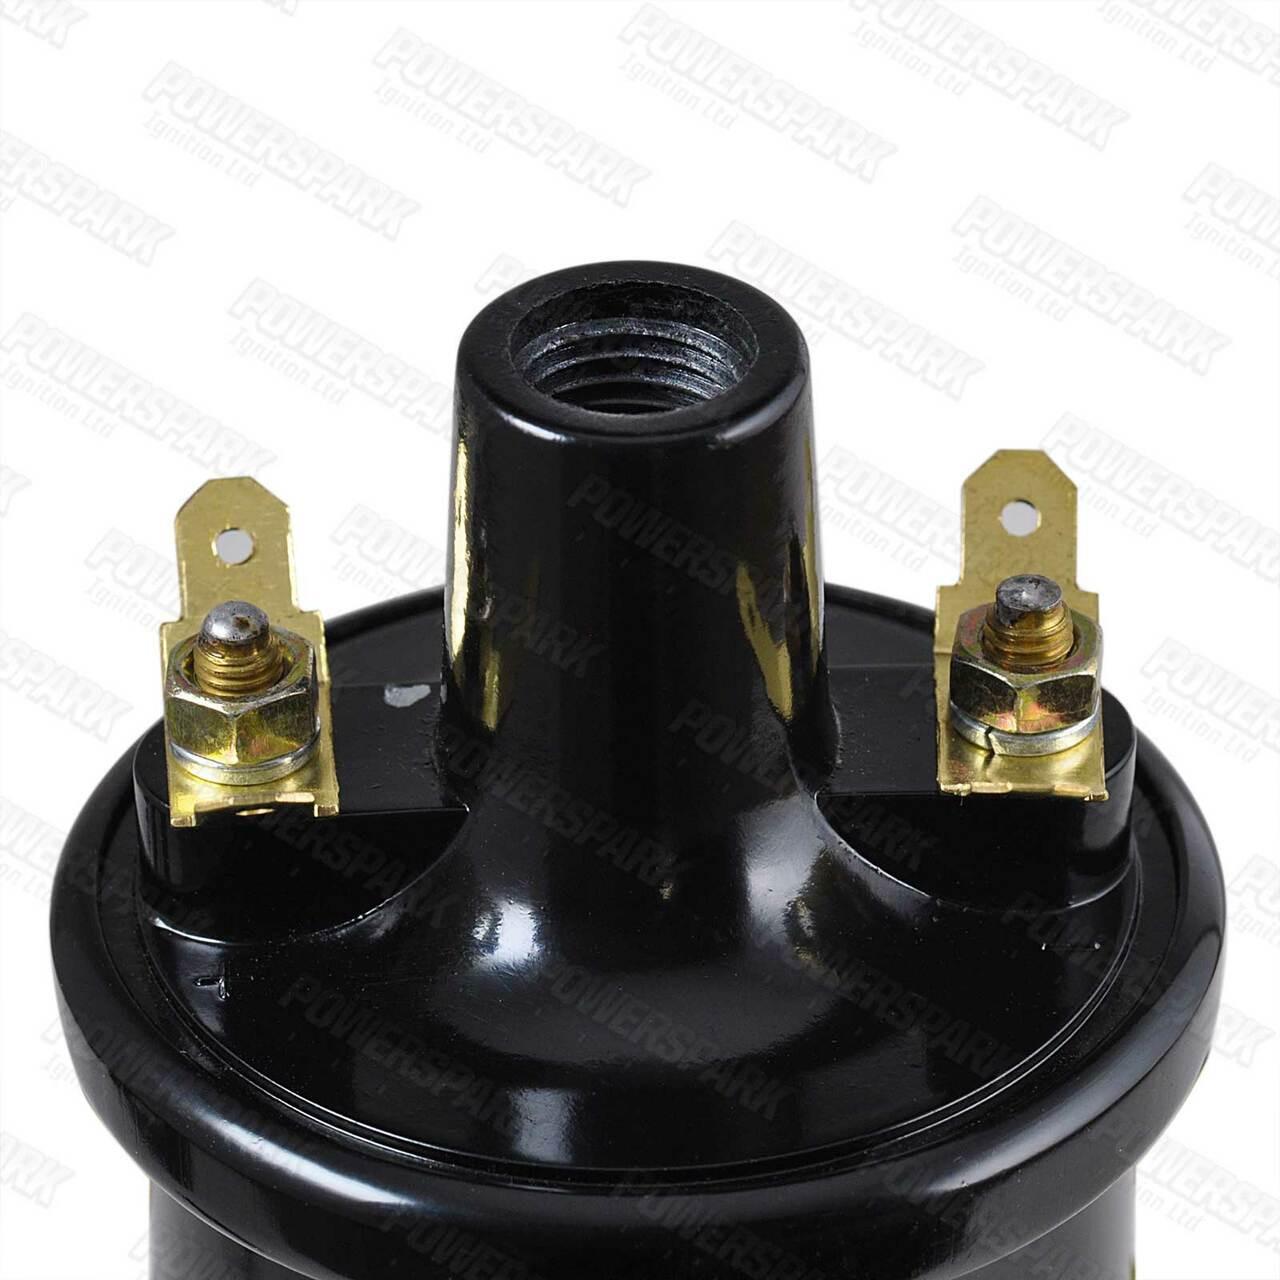 Powerspark Powerspark 12v Ignition Coil - Acorn screw HT connector